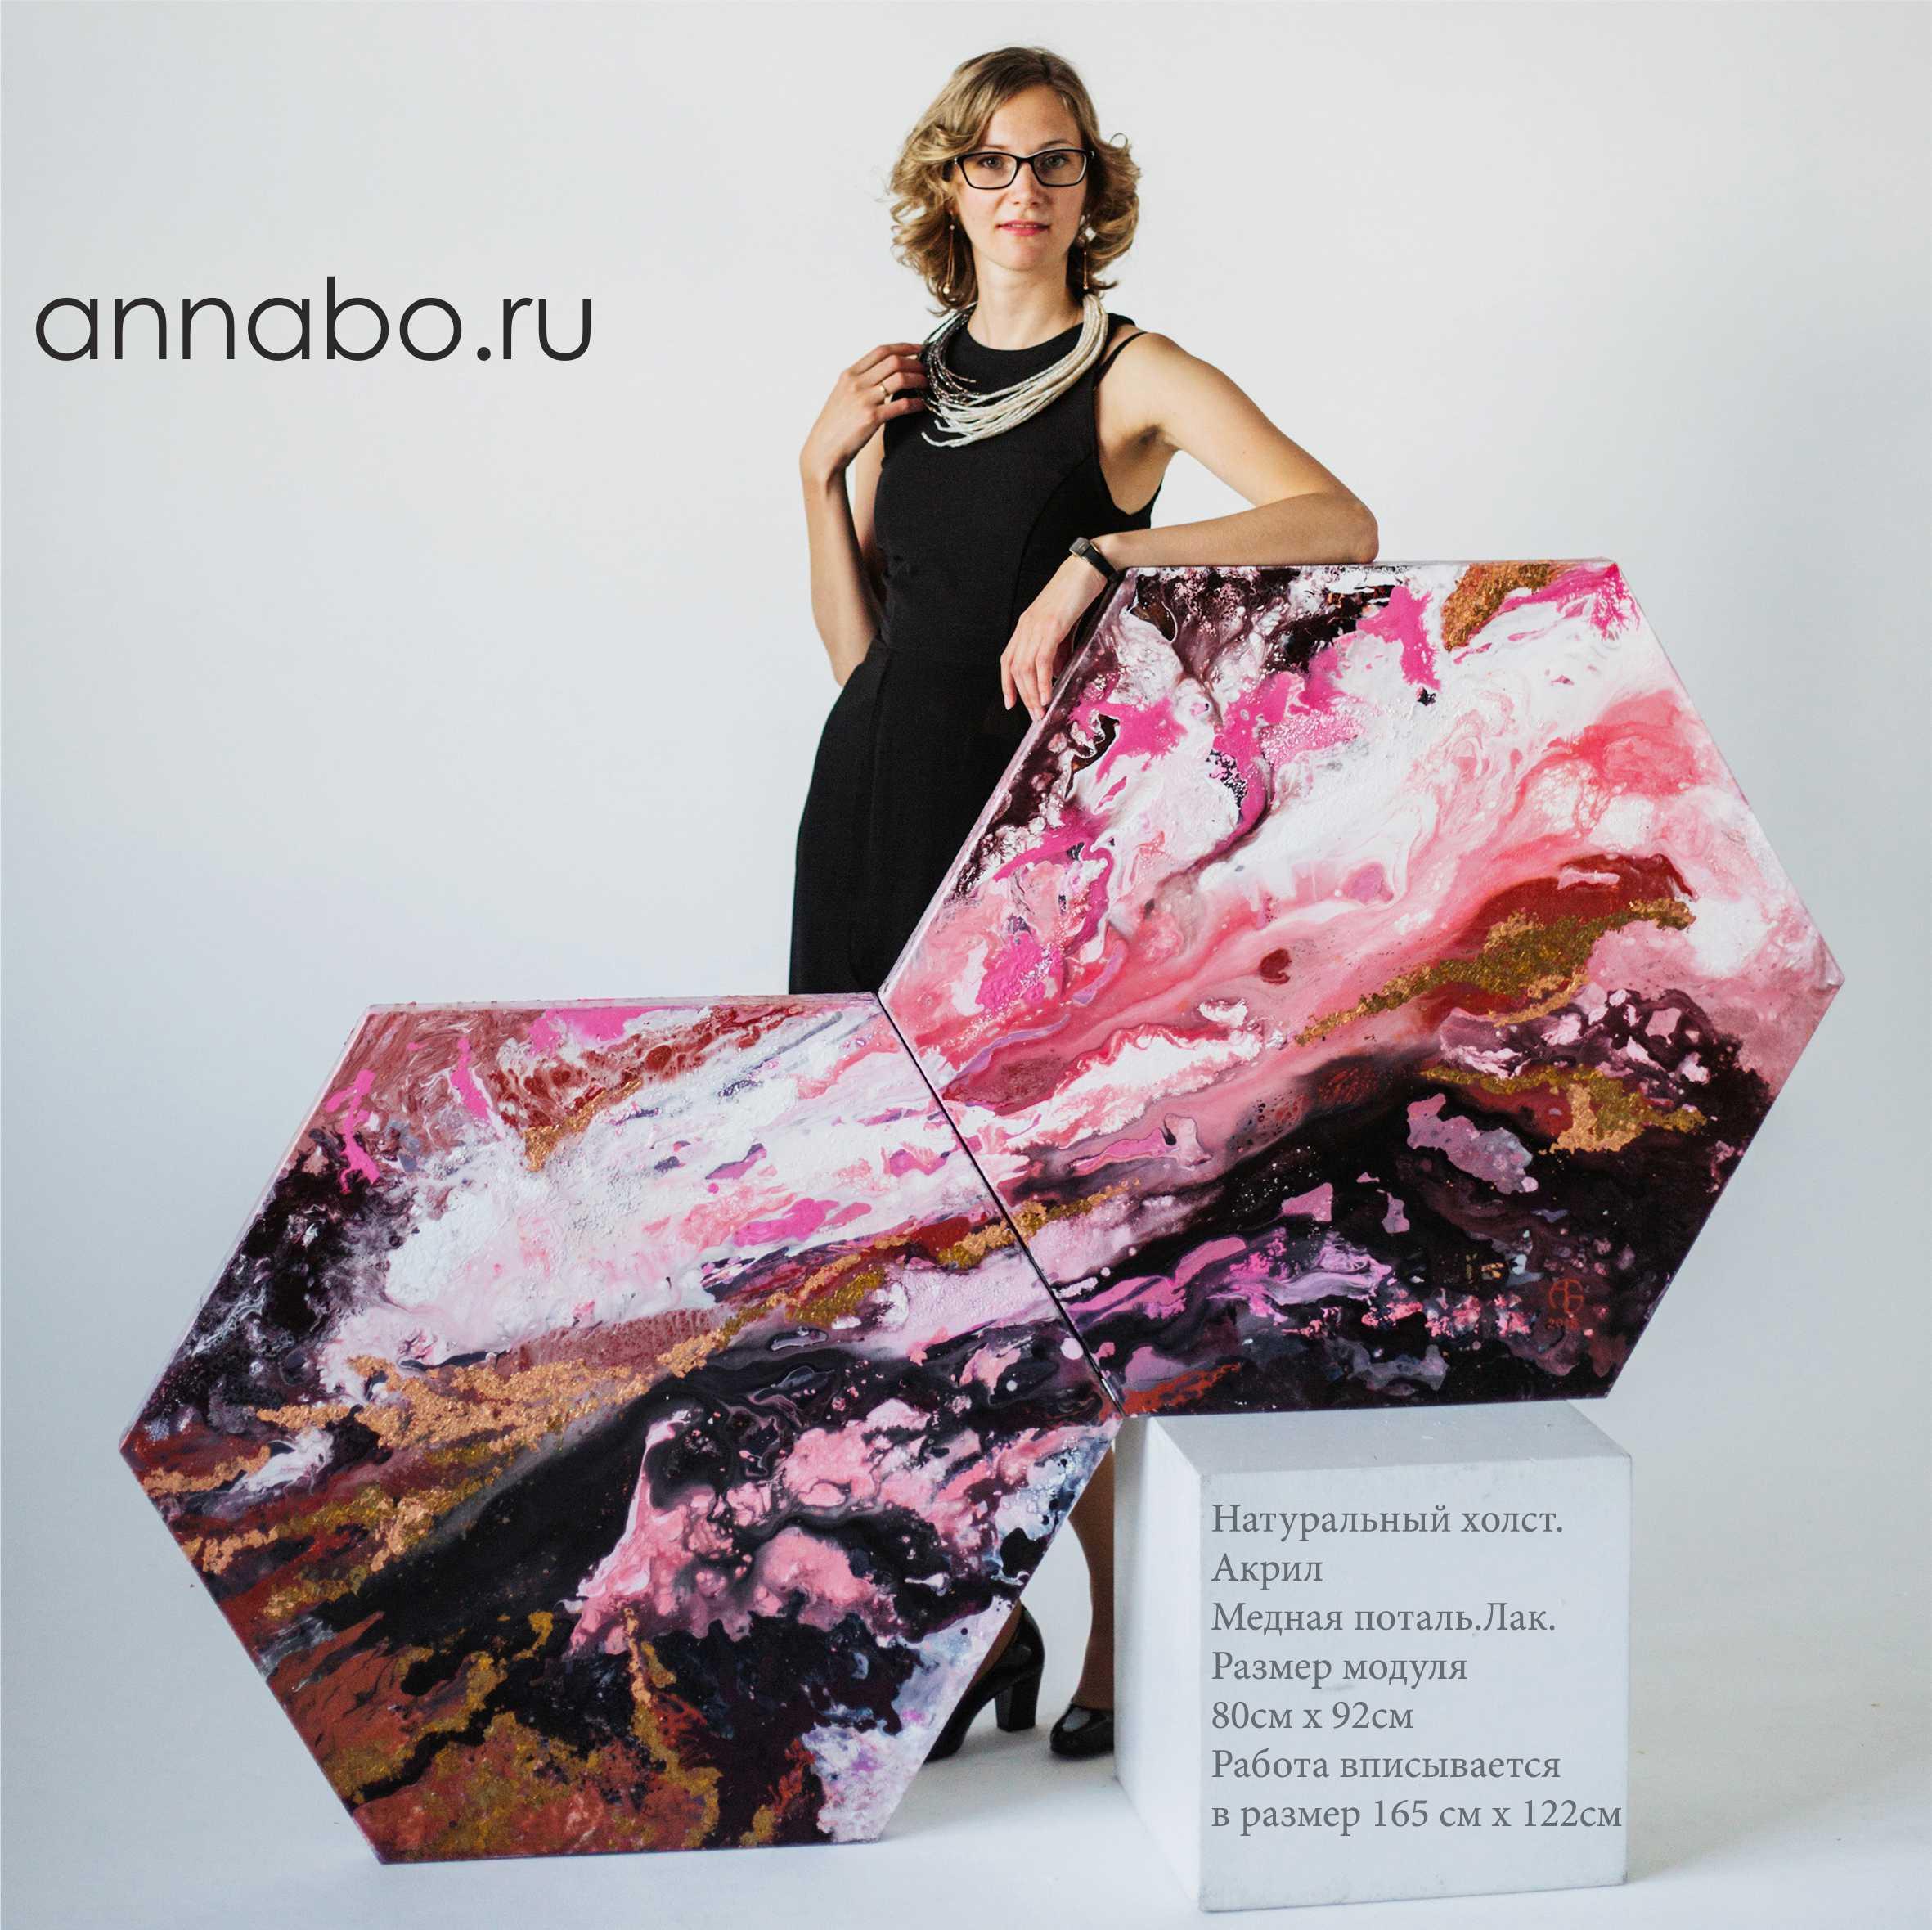 ANNABO_RU